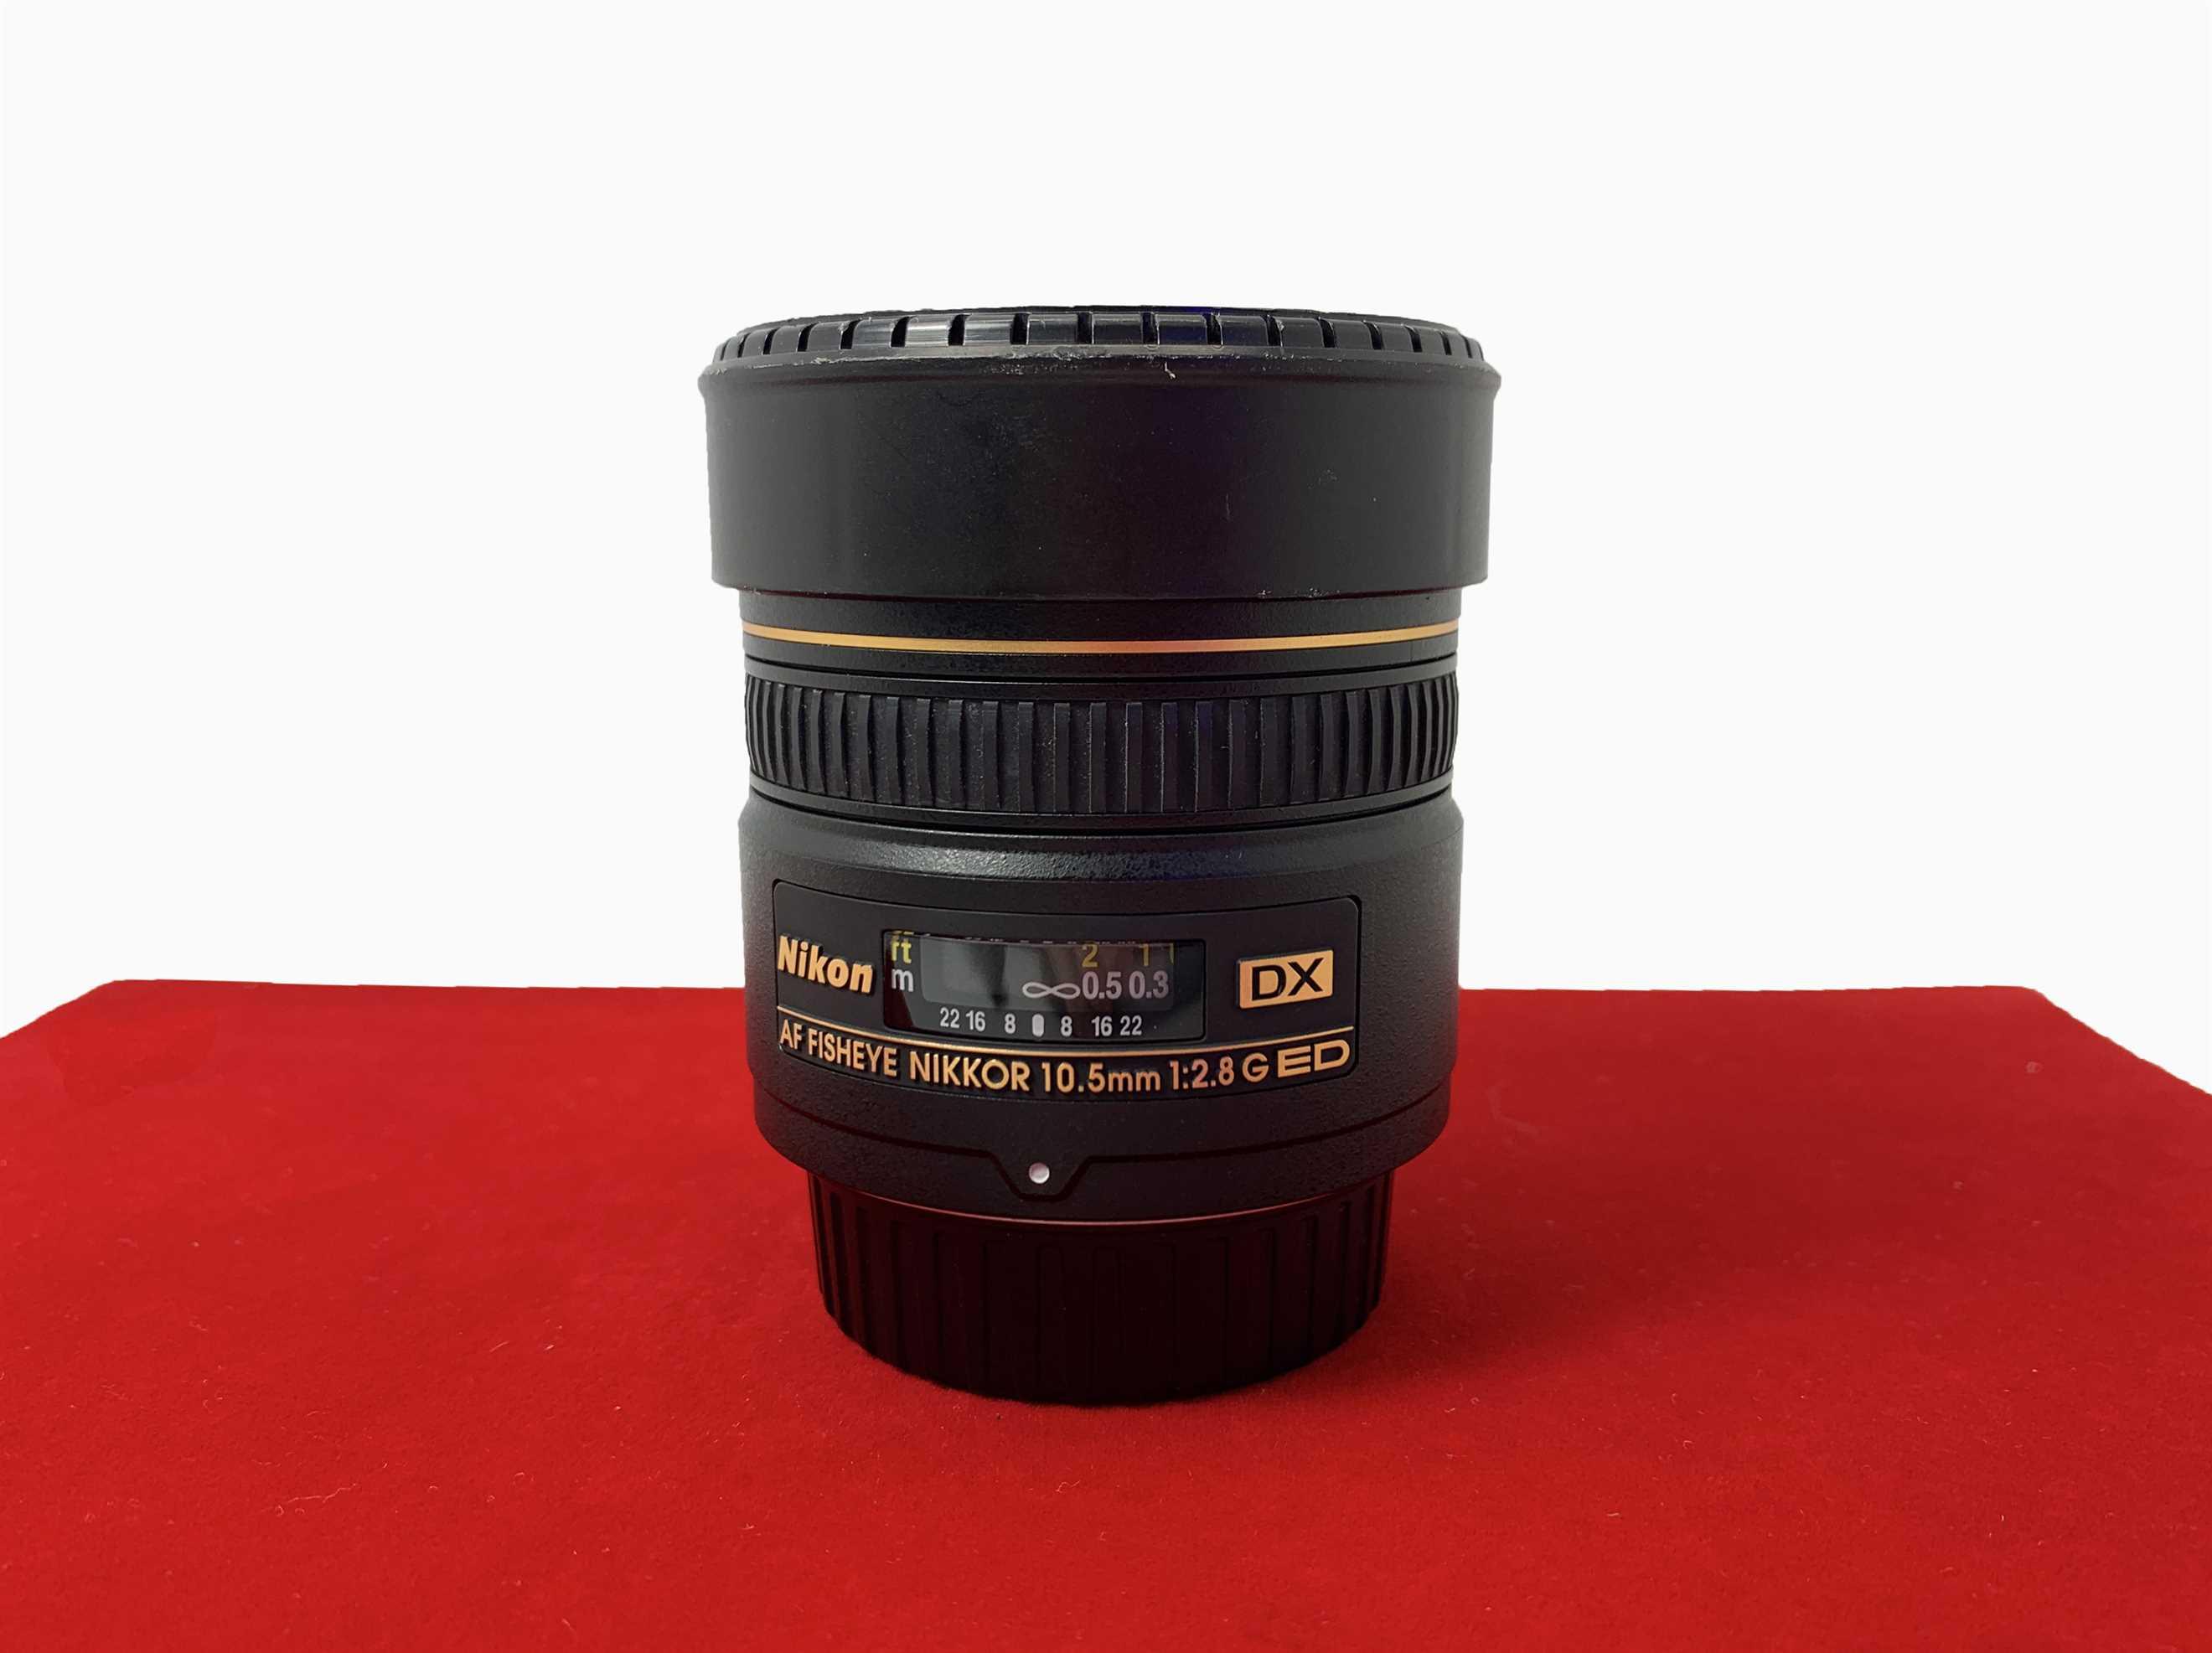 [USED-PJ33] Nikon 10.5MM F2.8G Fisheye AF DX Lens,90% Like New Condition (S/N:389352)